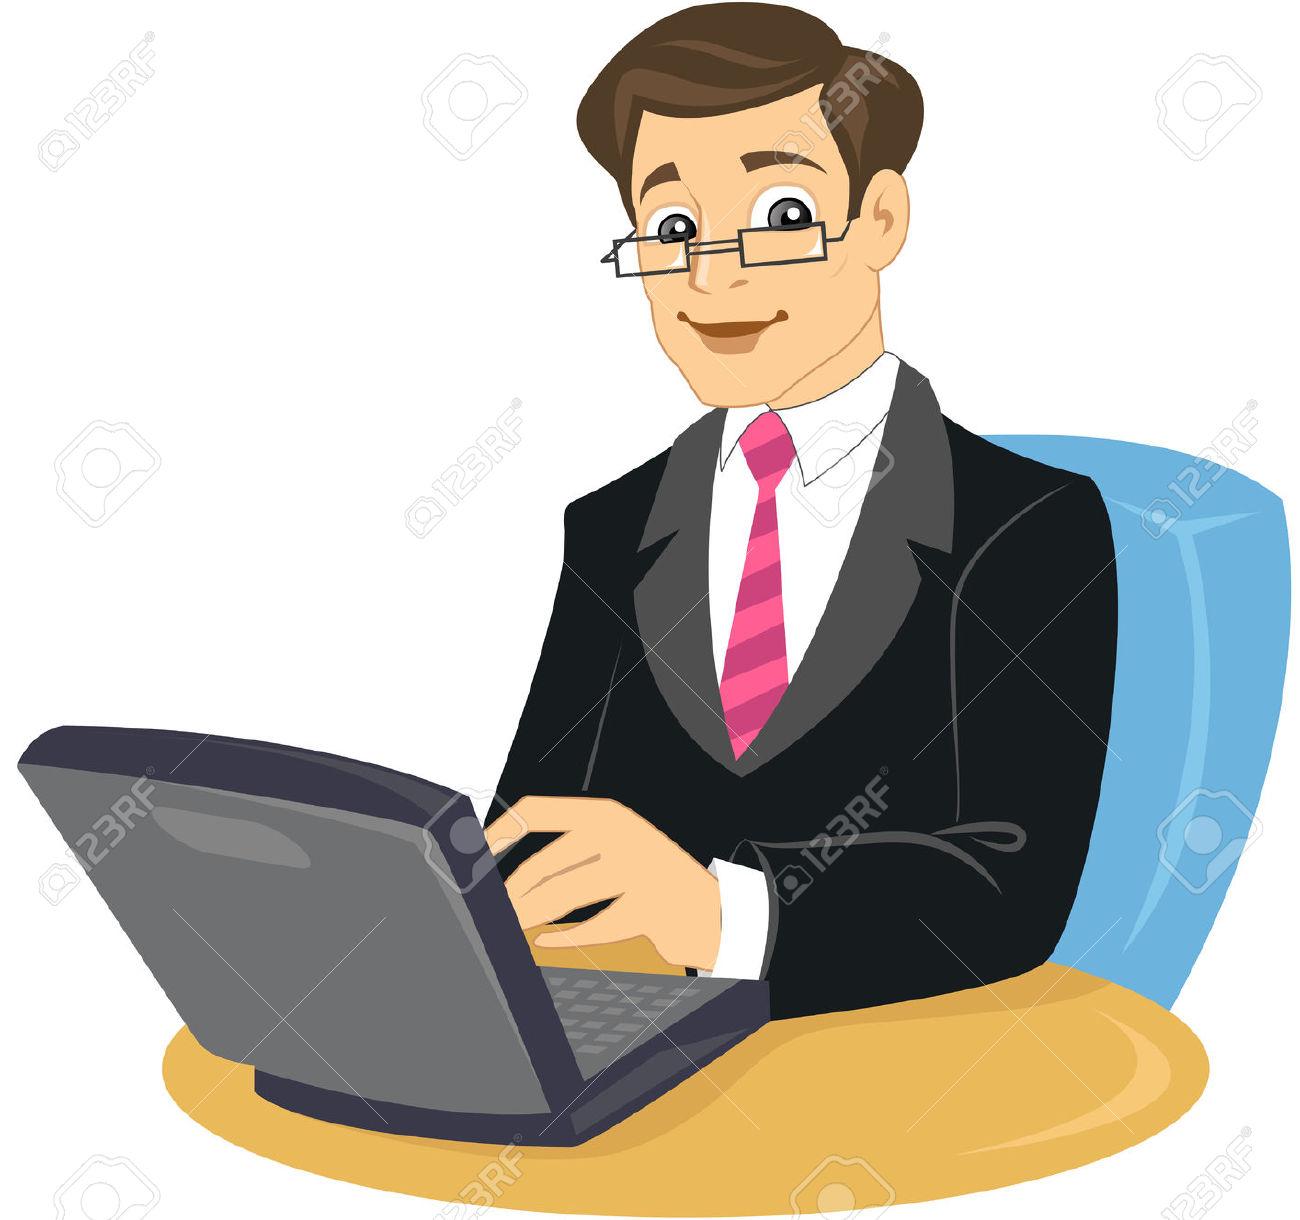 Executive Director jobs in Pakistan